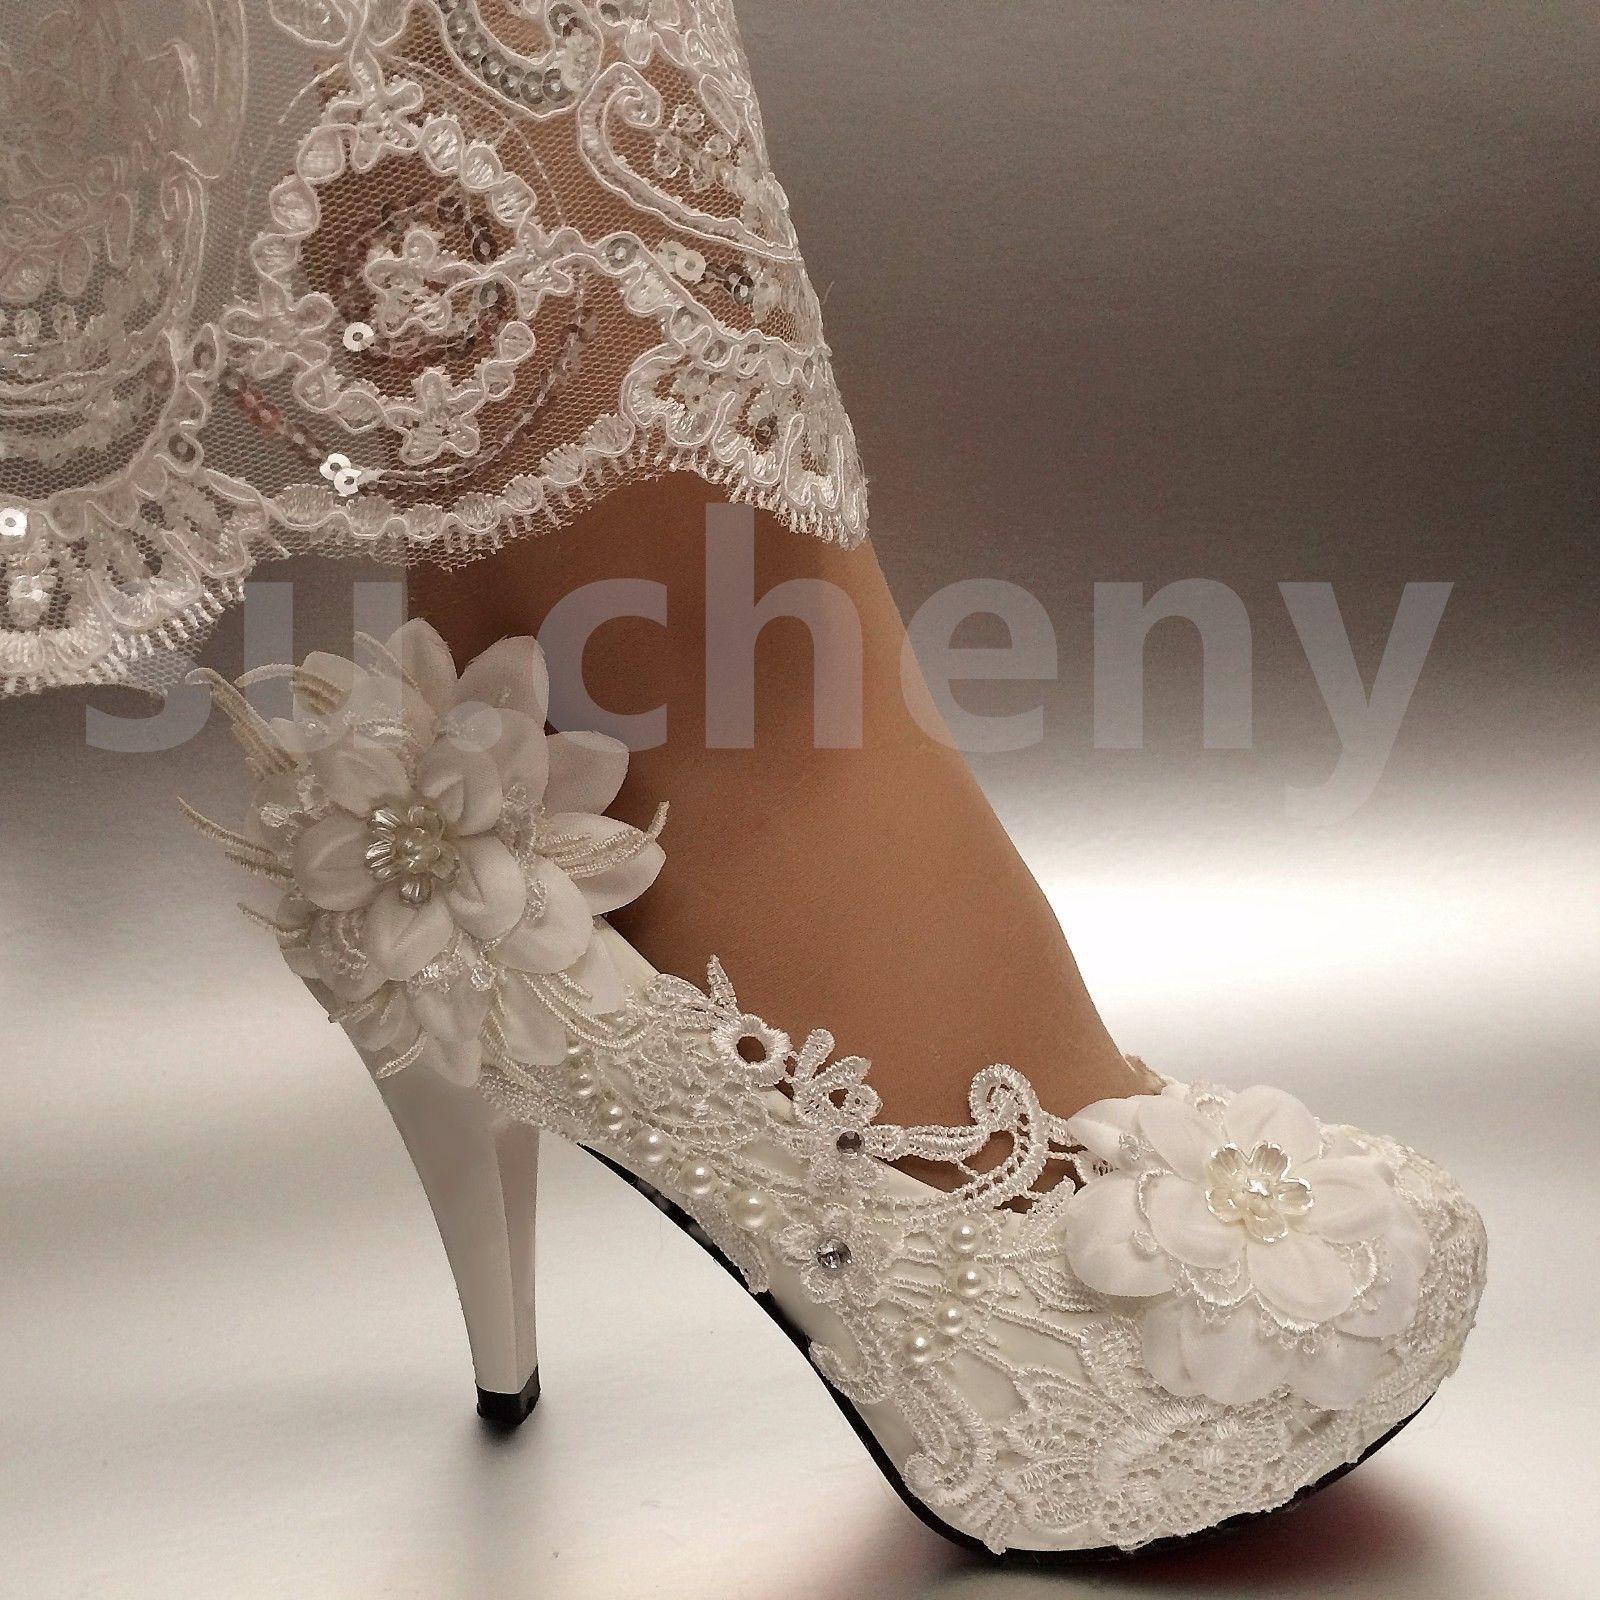 Su Cheny 2 3 4 White Ivory Heels Lace Ribbon Crystal Pearl Wedding Bridal Shoes Ivory Heels Wedding Shoes Bride Pearl Wedding Shoes